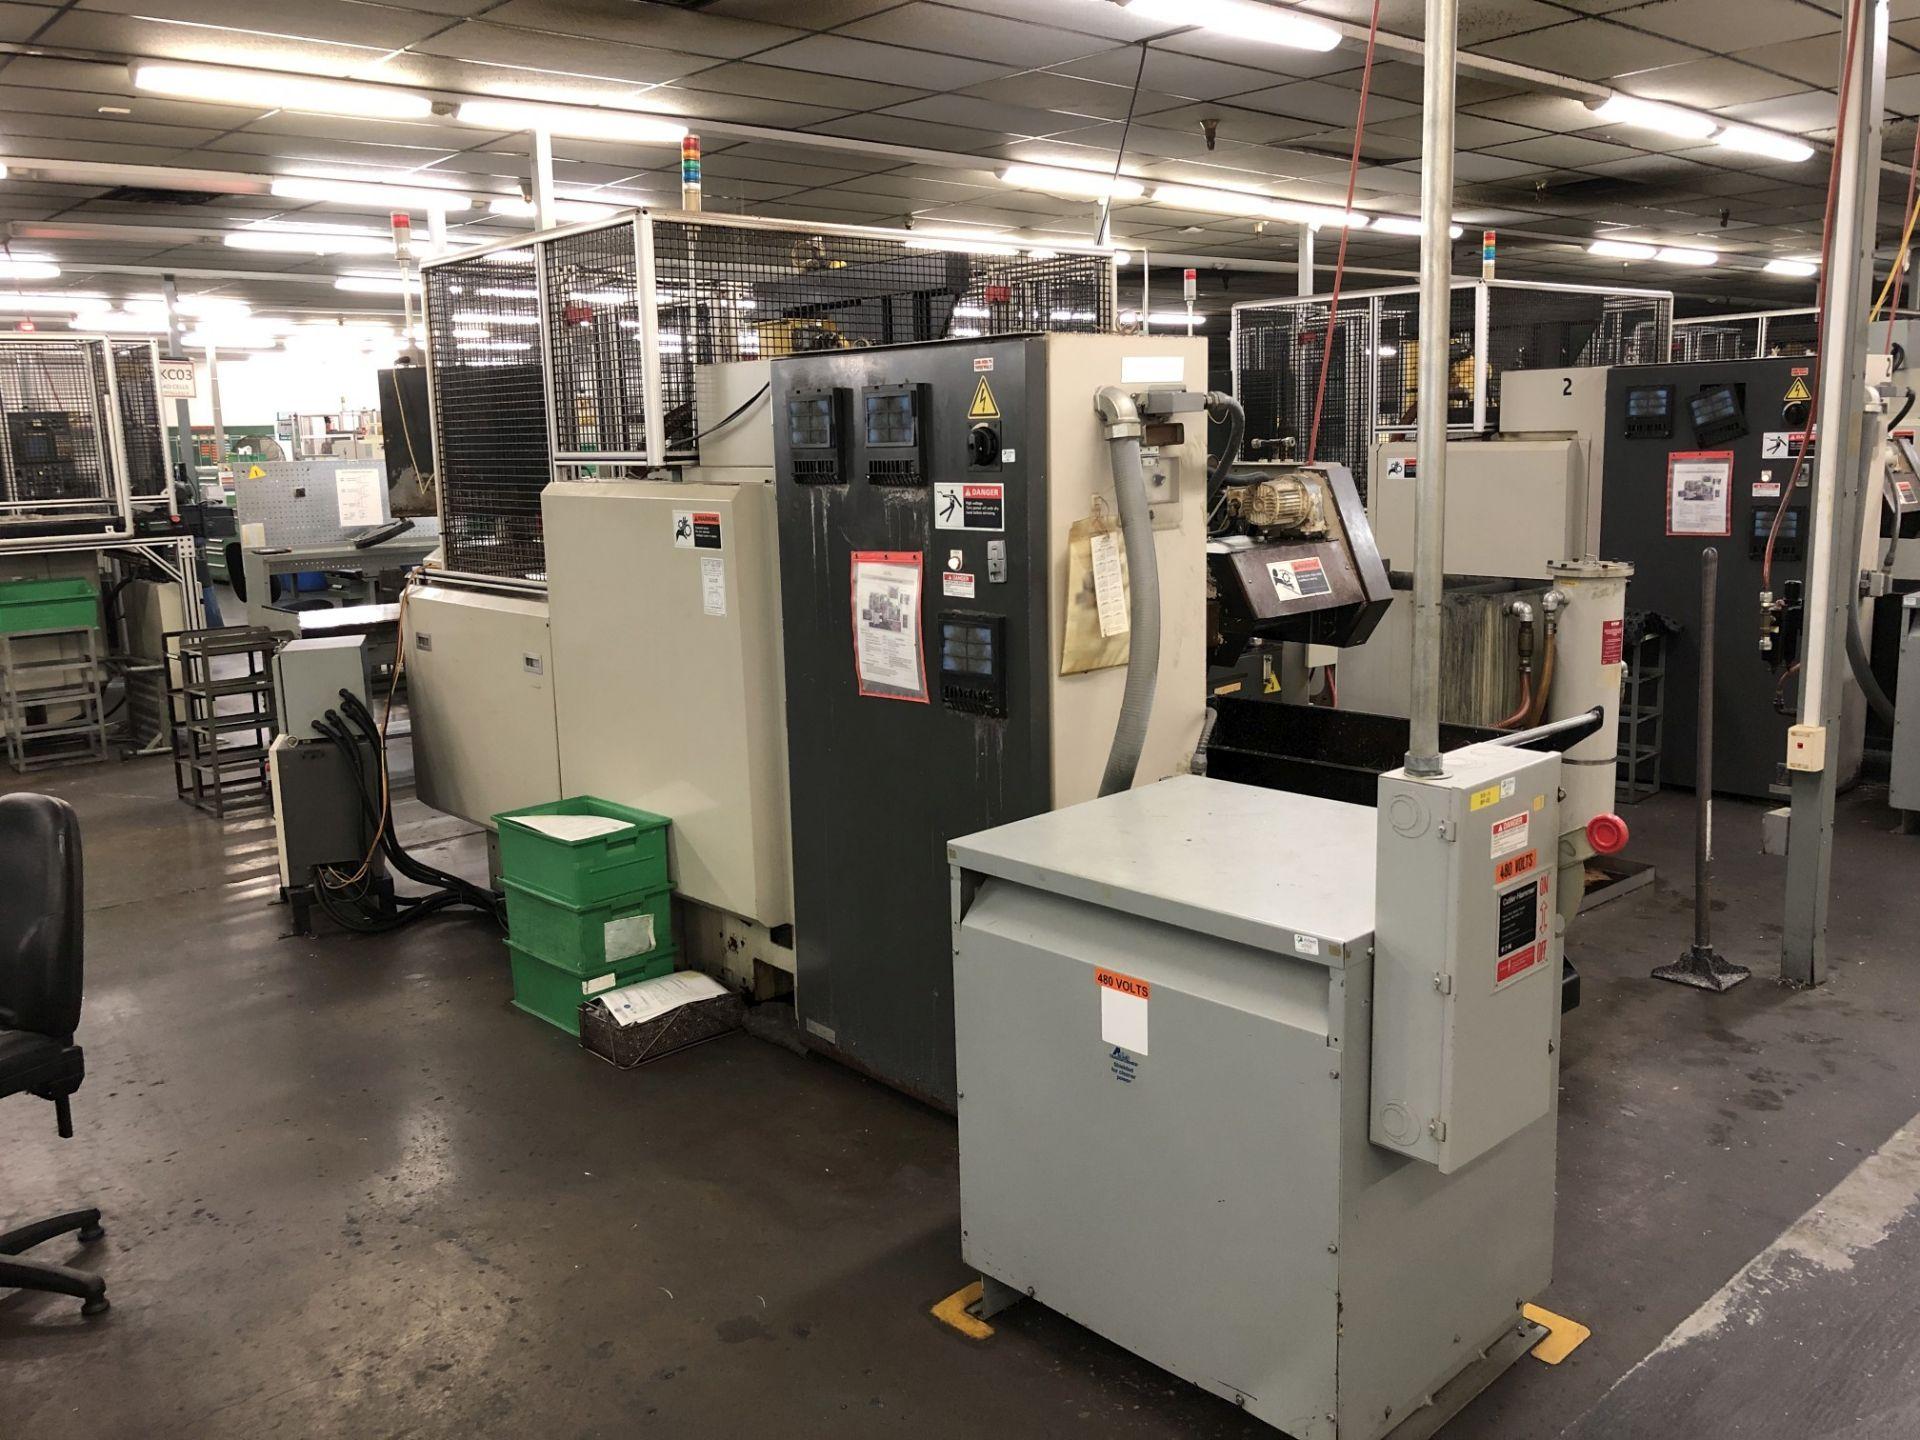 1999 Kitako MT4-200 Multi-Spindle CNC Turning Mill - Image 8 of 16